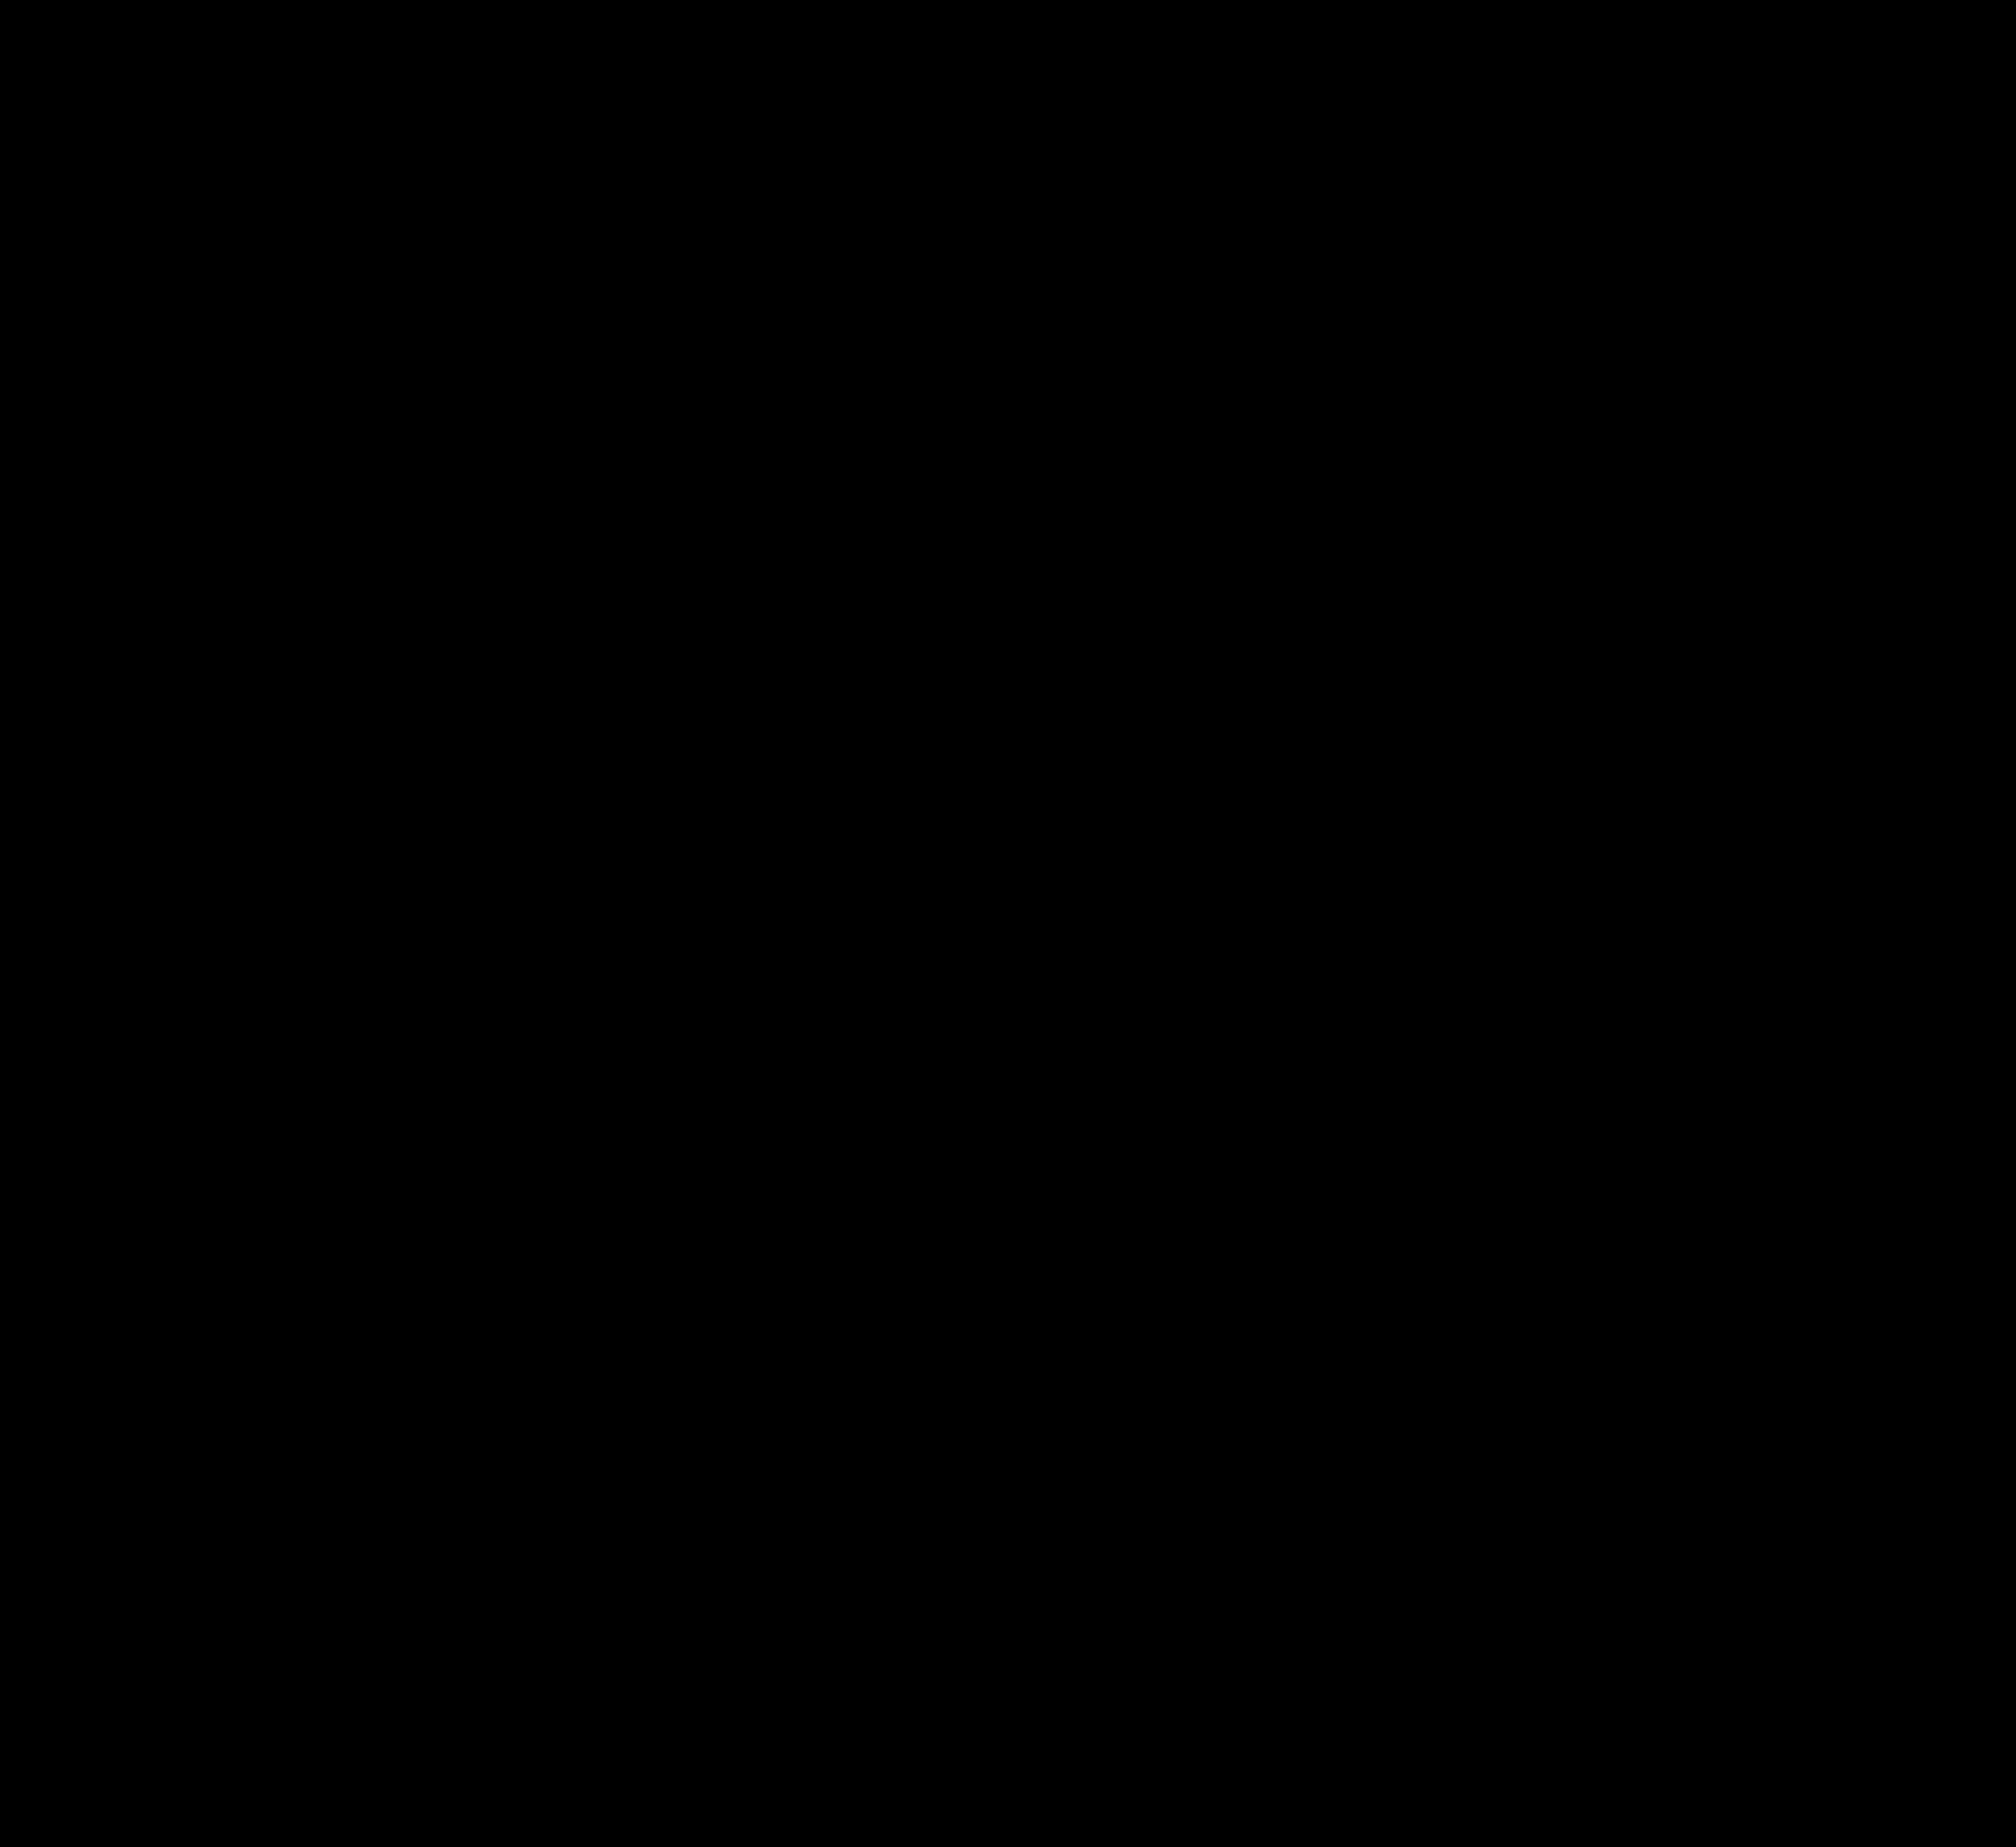 Circular silhouette big image. Circle clipart dragon